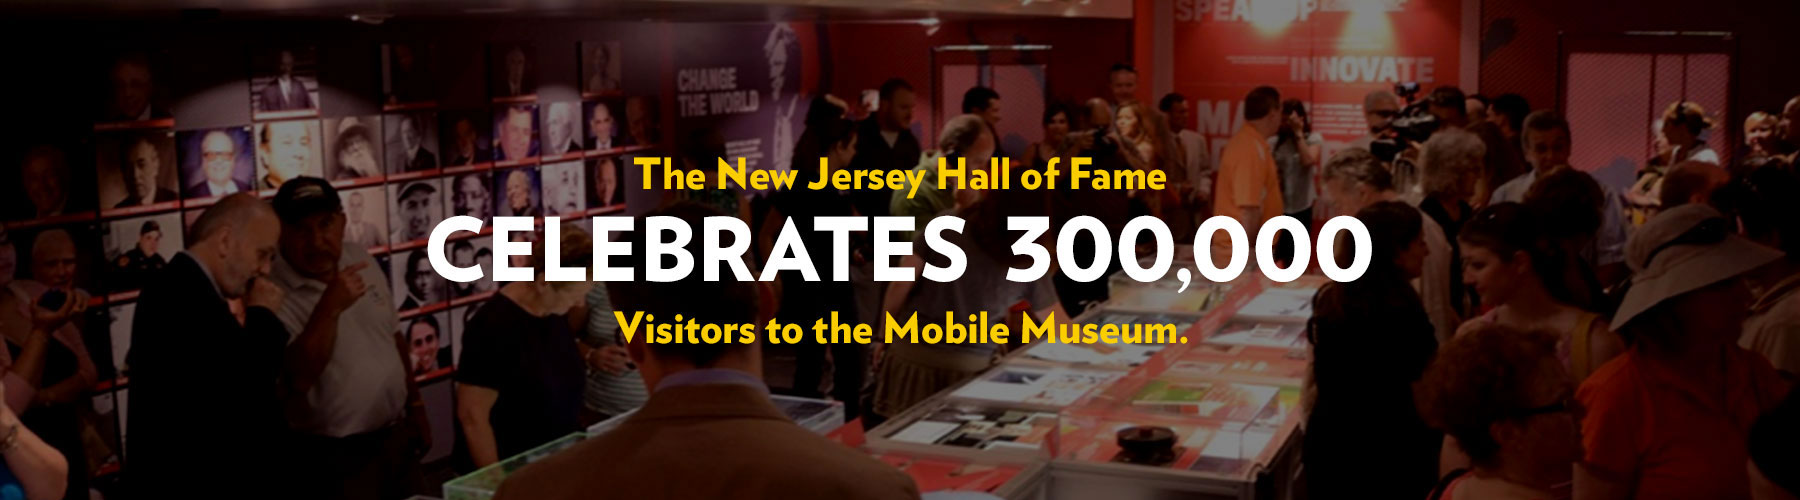 300000 Visitors